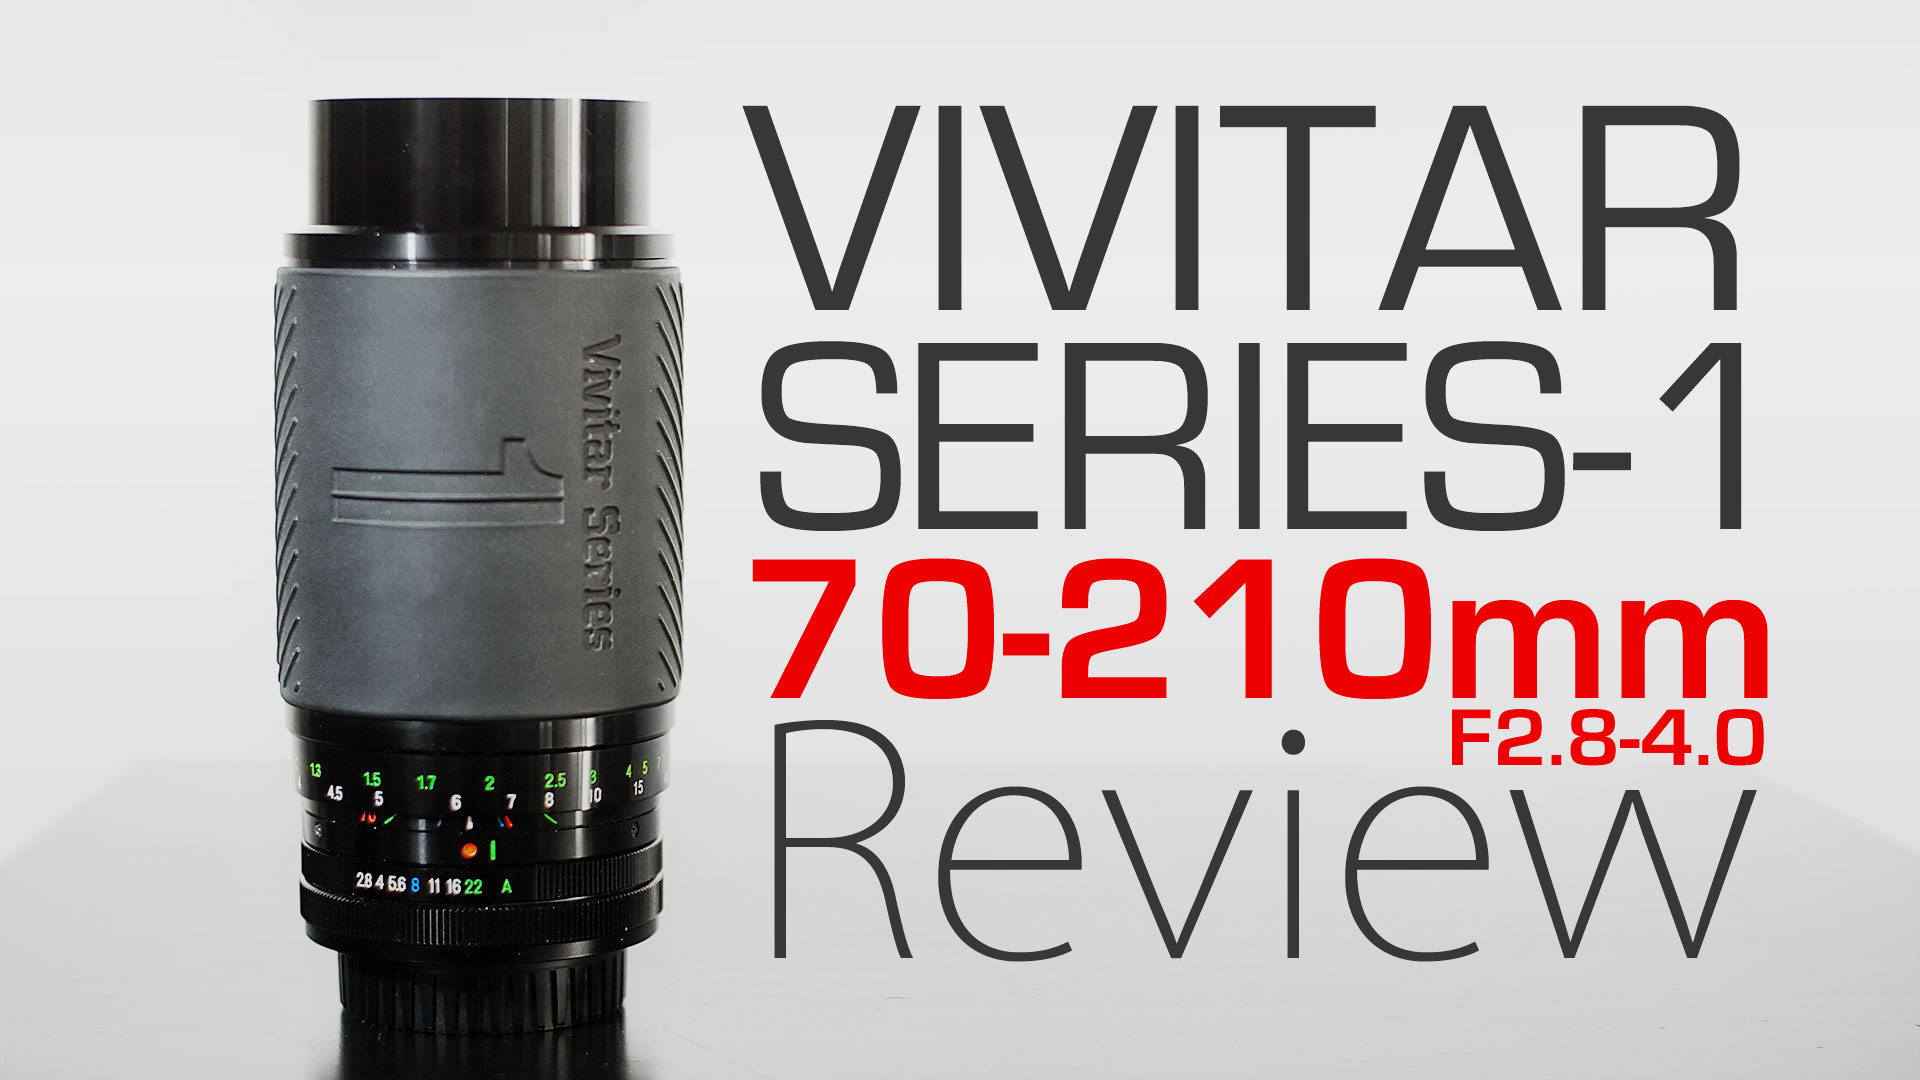 Vivitar Series-1 70-210mm F2.8-4.0 REVIEW